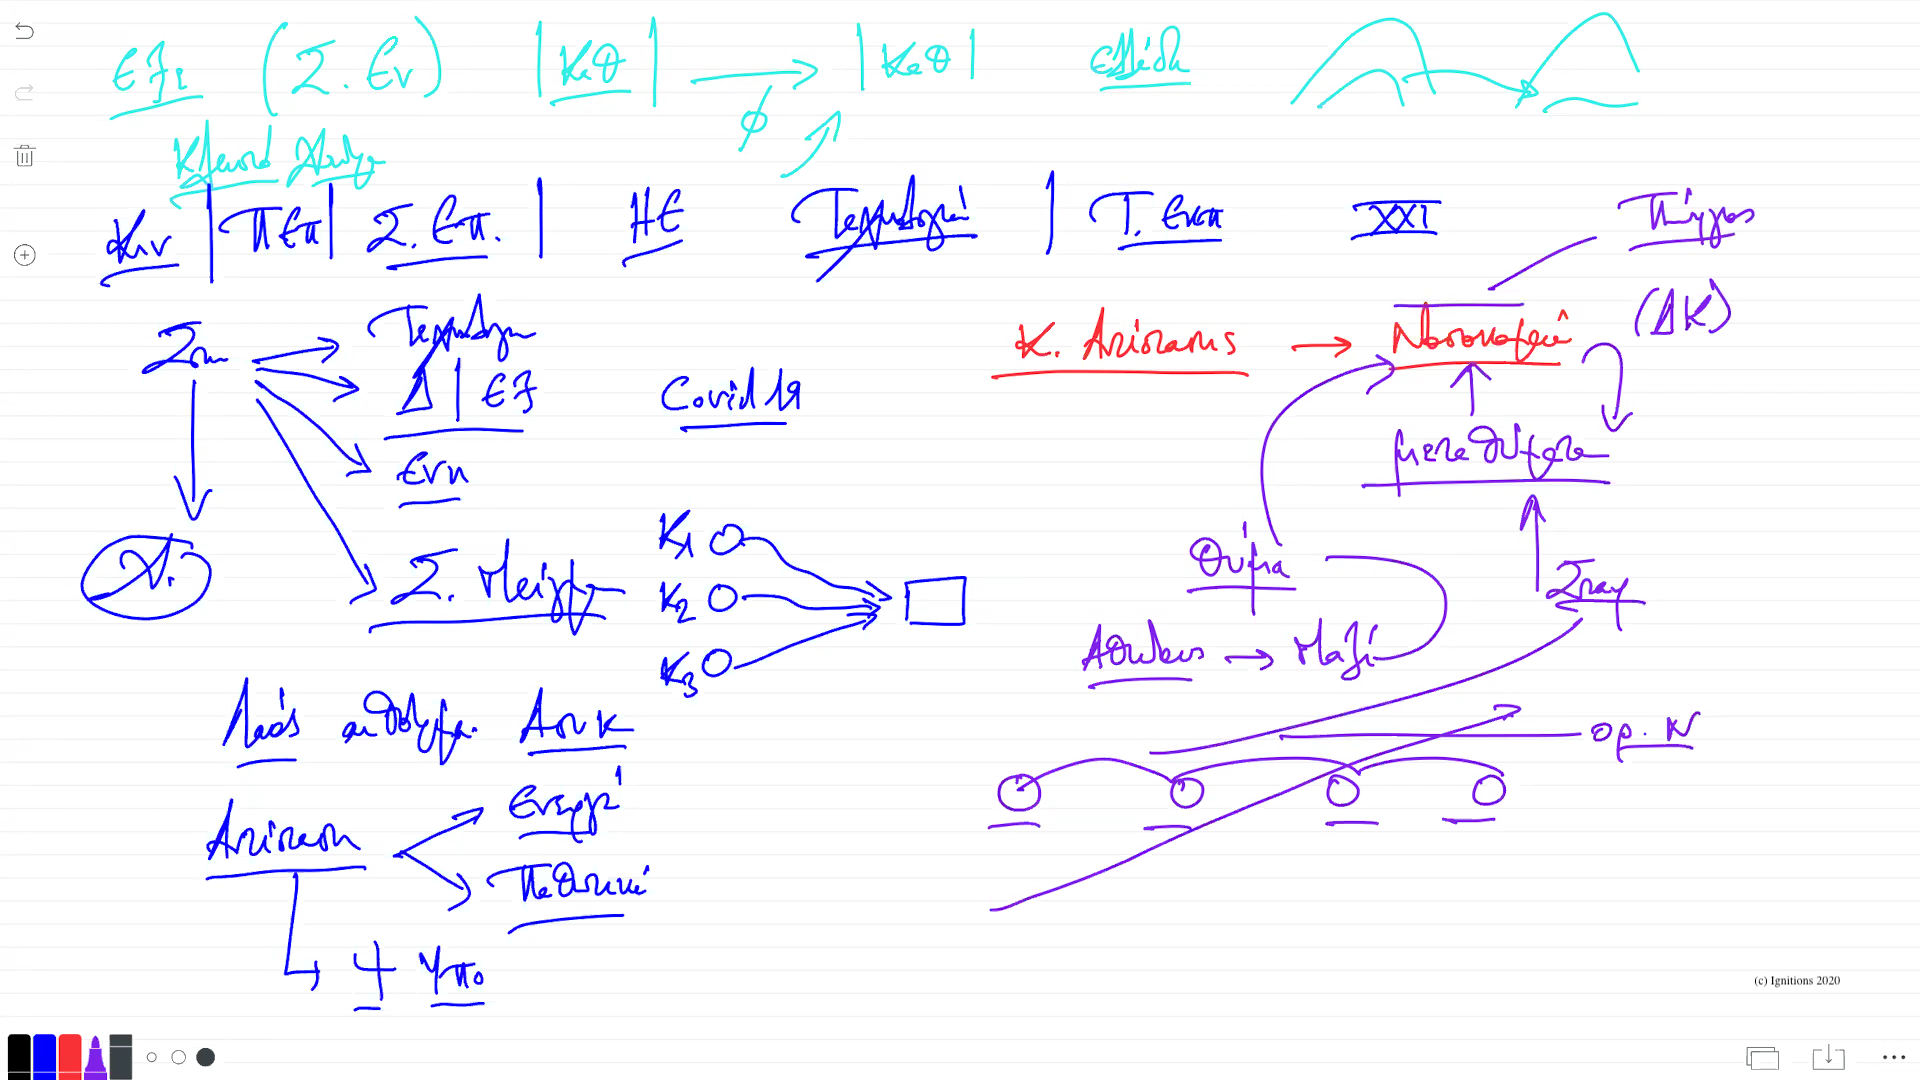 55525 - VIII - e-Διάλεξη: Στρατηγική Διαχείριση Πανδημίας. (Dessin)